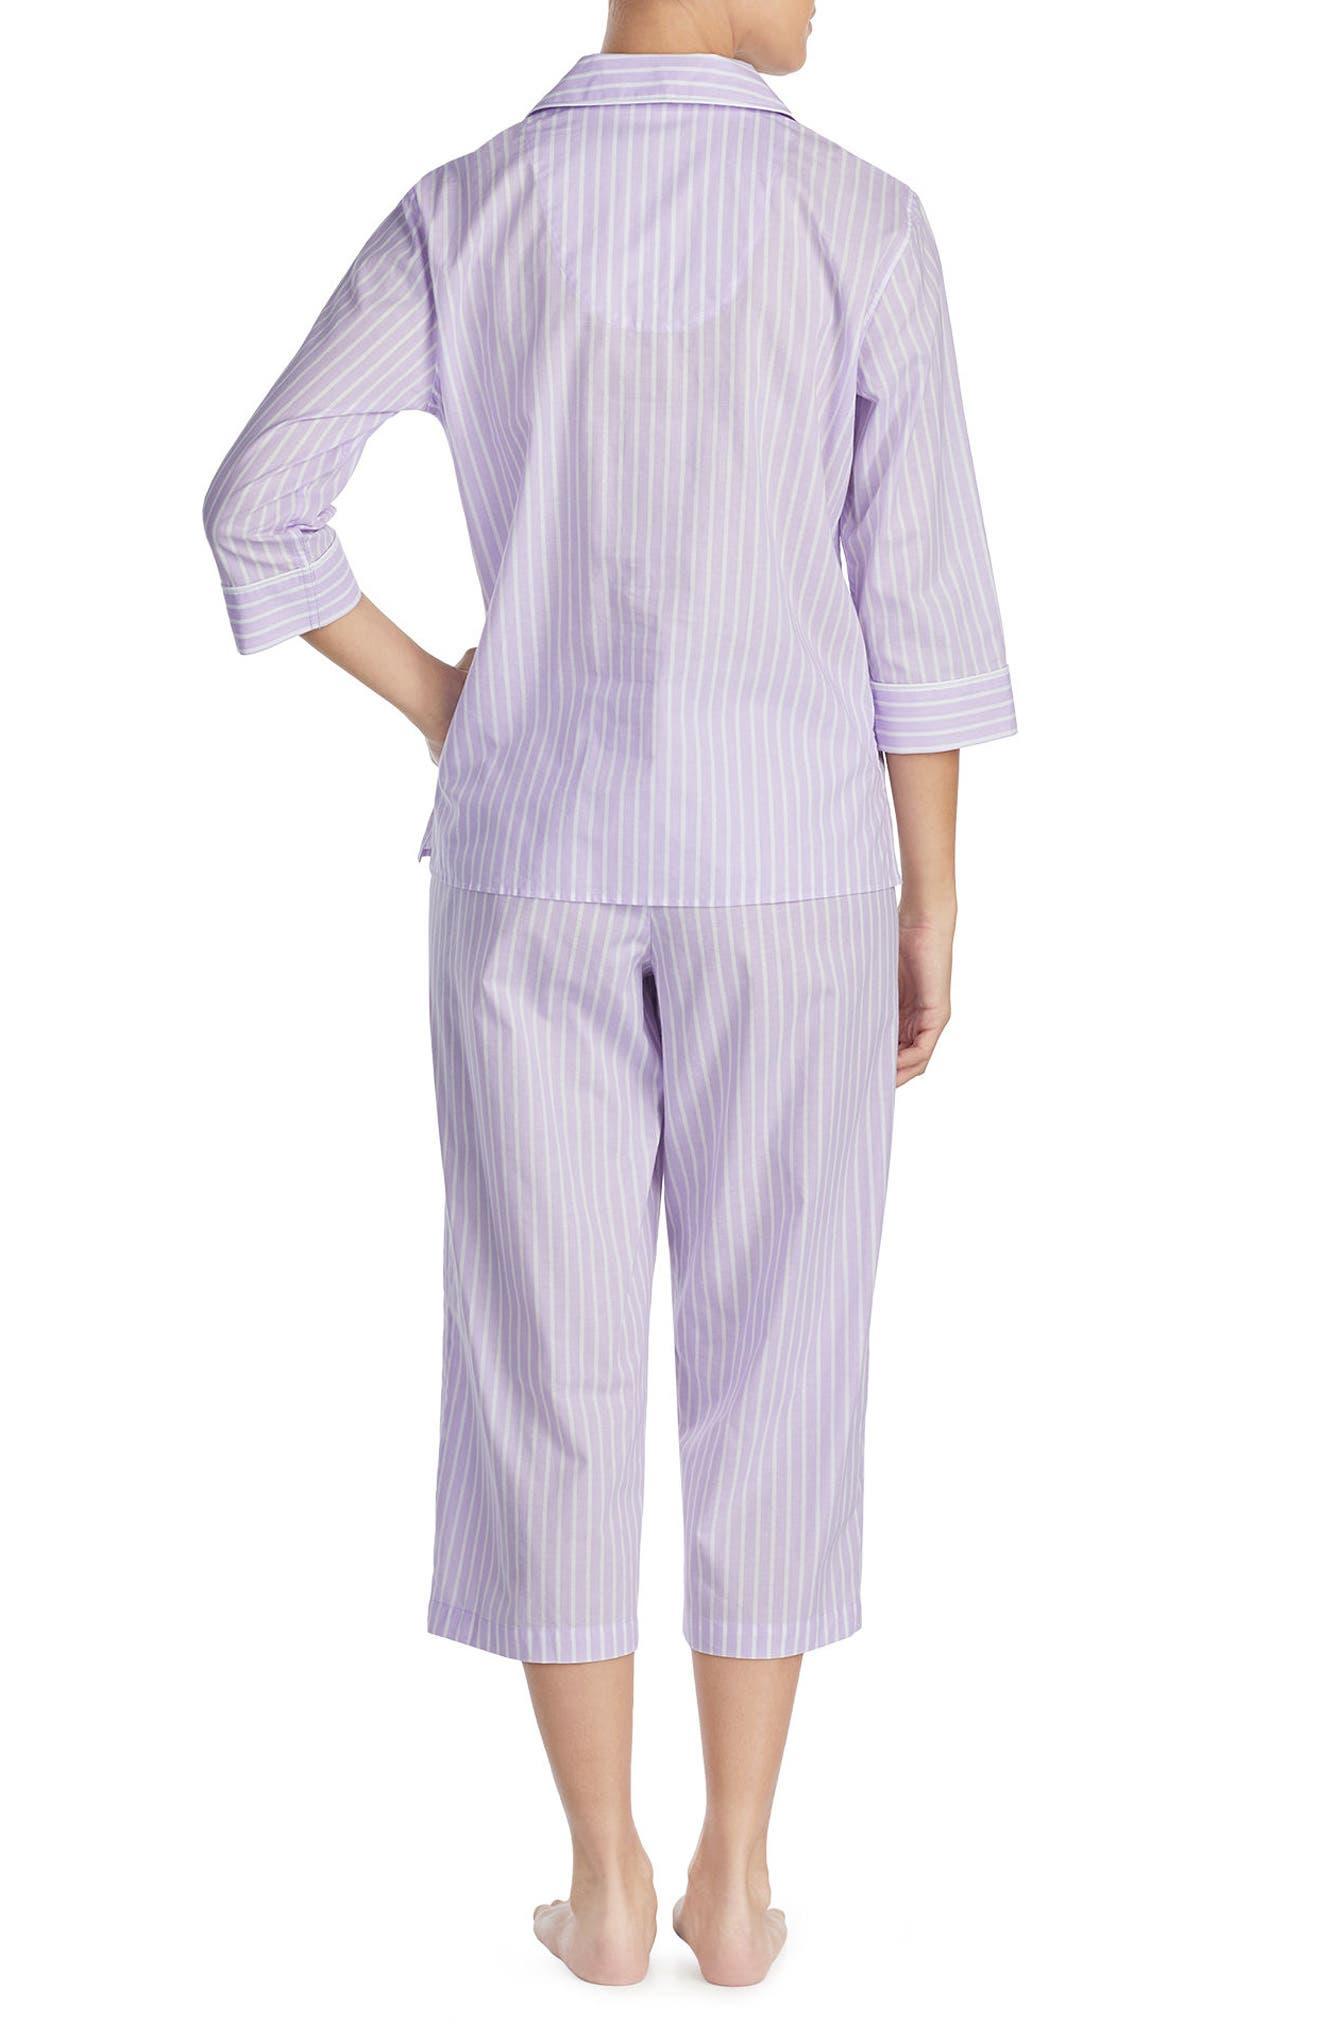 Capri Pajamas,                             Alternate thumbnail 2, color,                             537